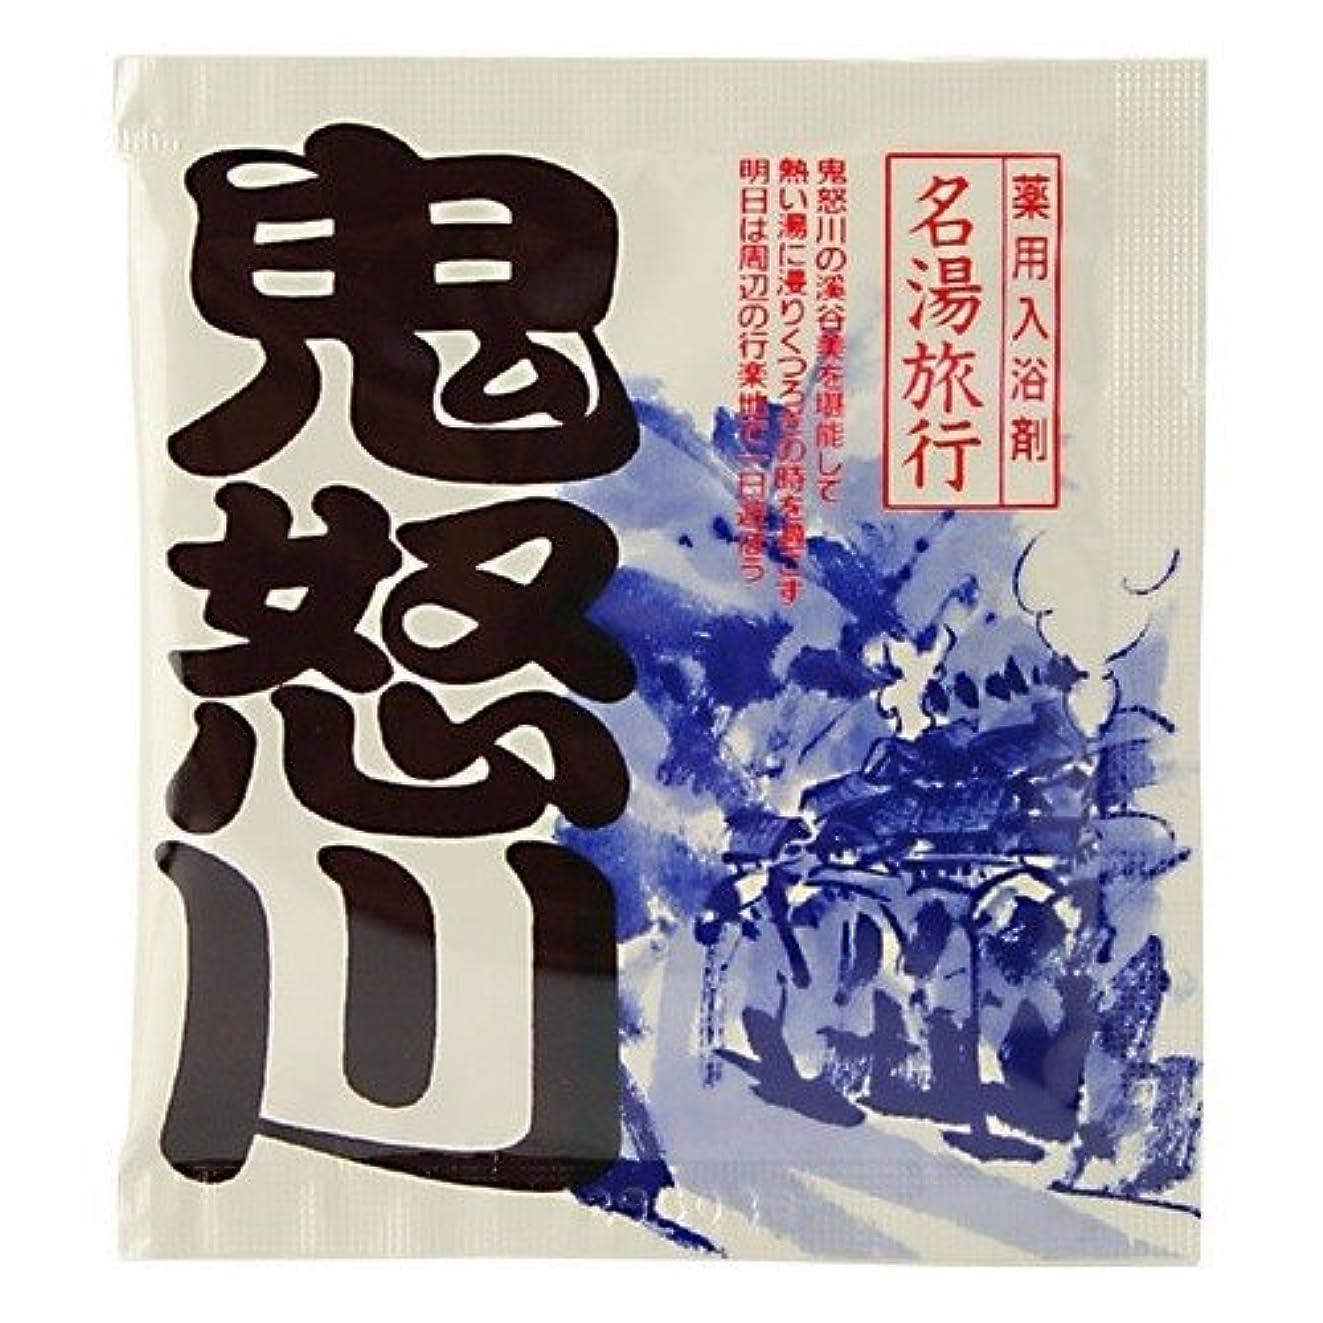 壮大提唱する練習五洲薬品 名湯旅行 鬼怒川 25g 4987332126706